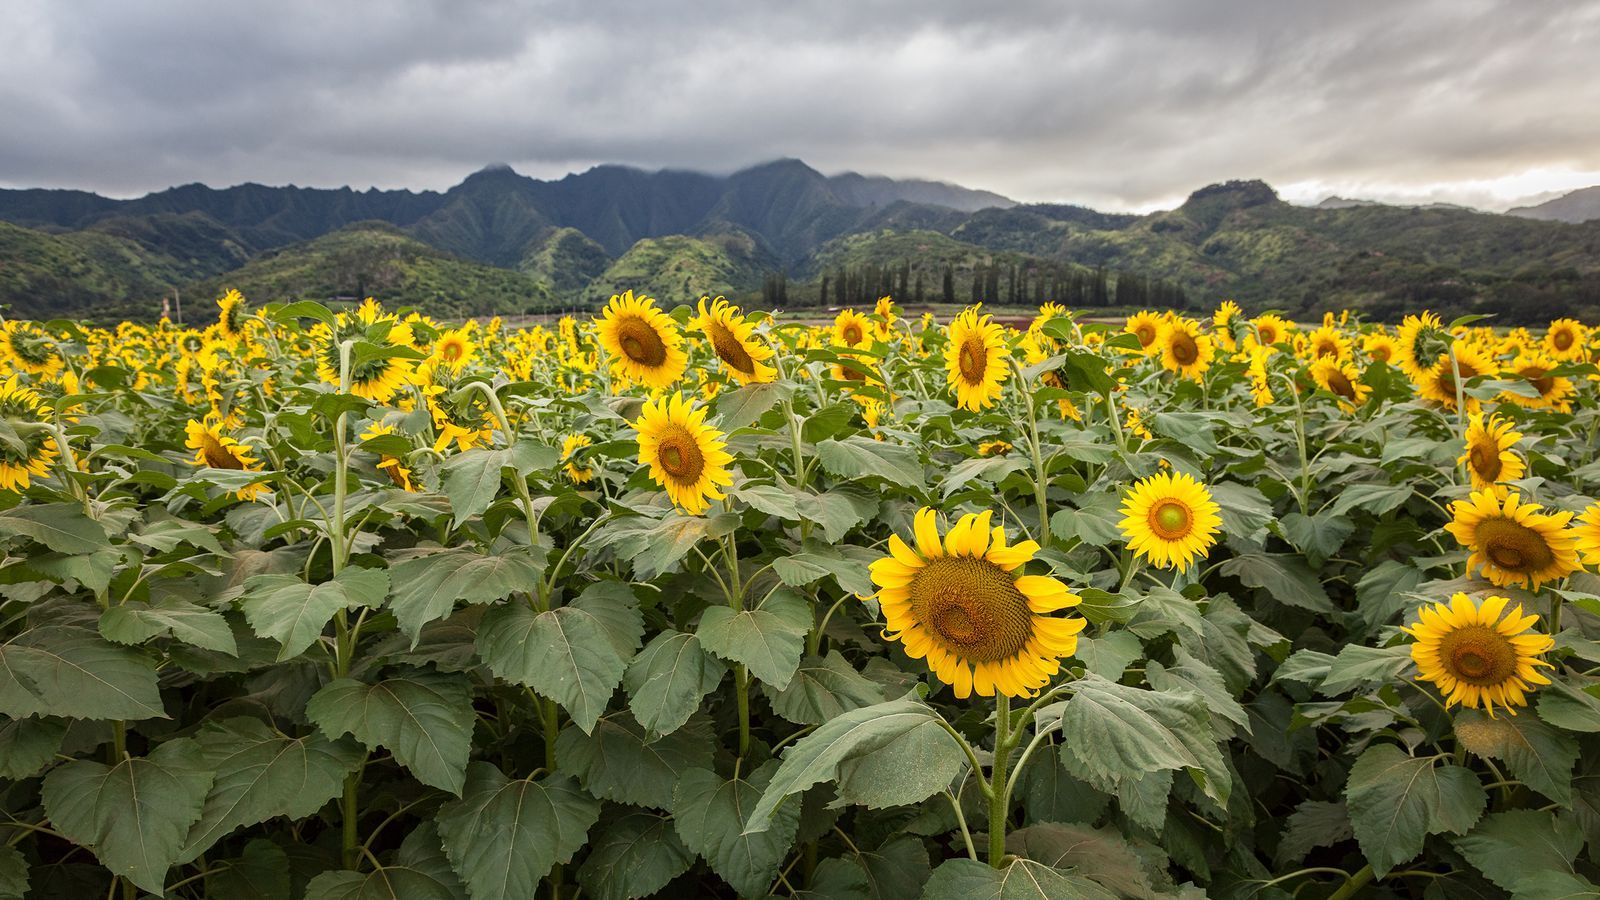 The 30 Prettiest Sunflower Fields Across the U.S. (With